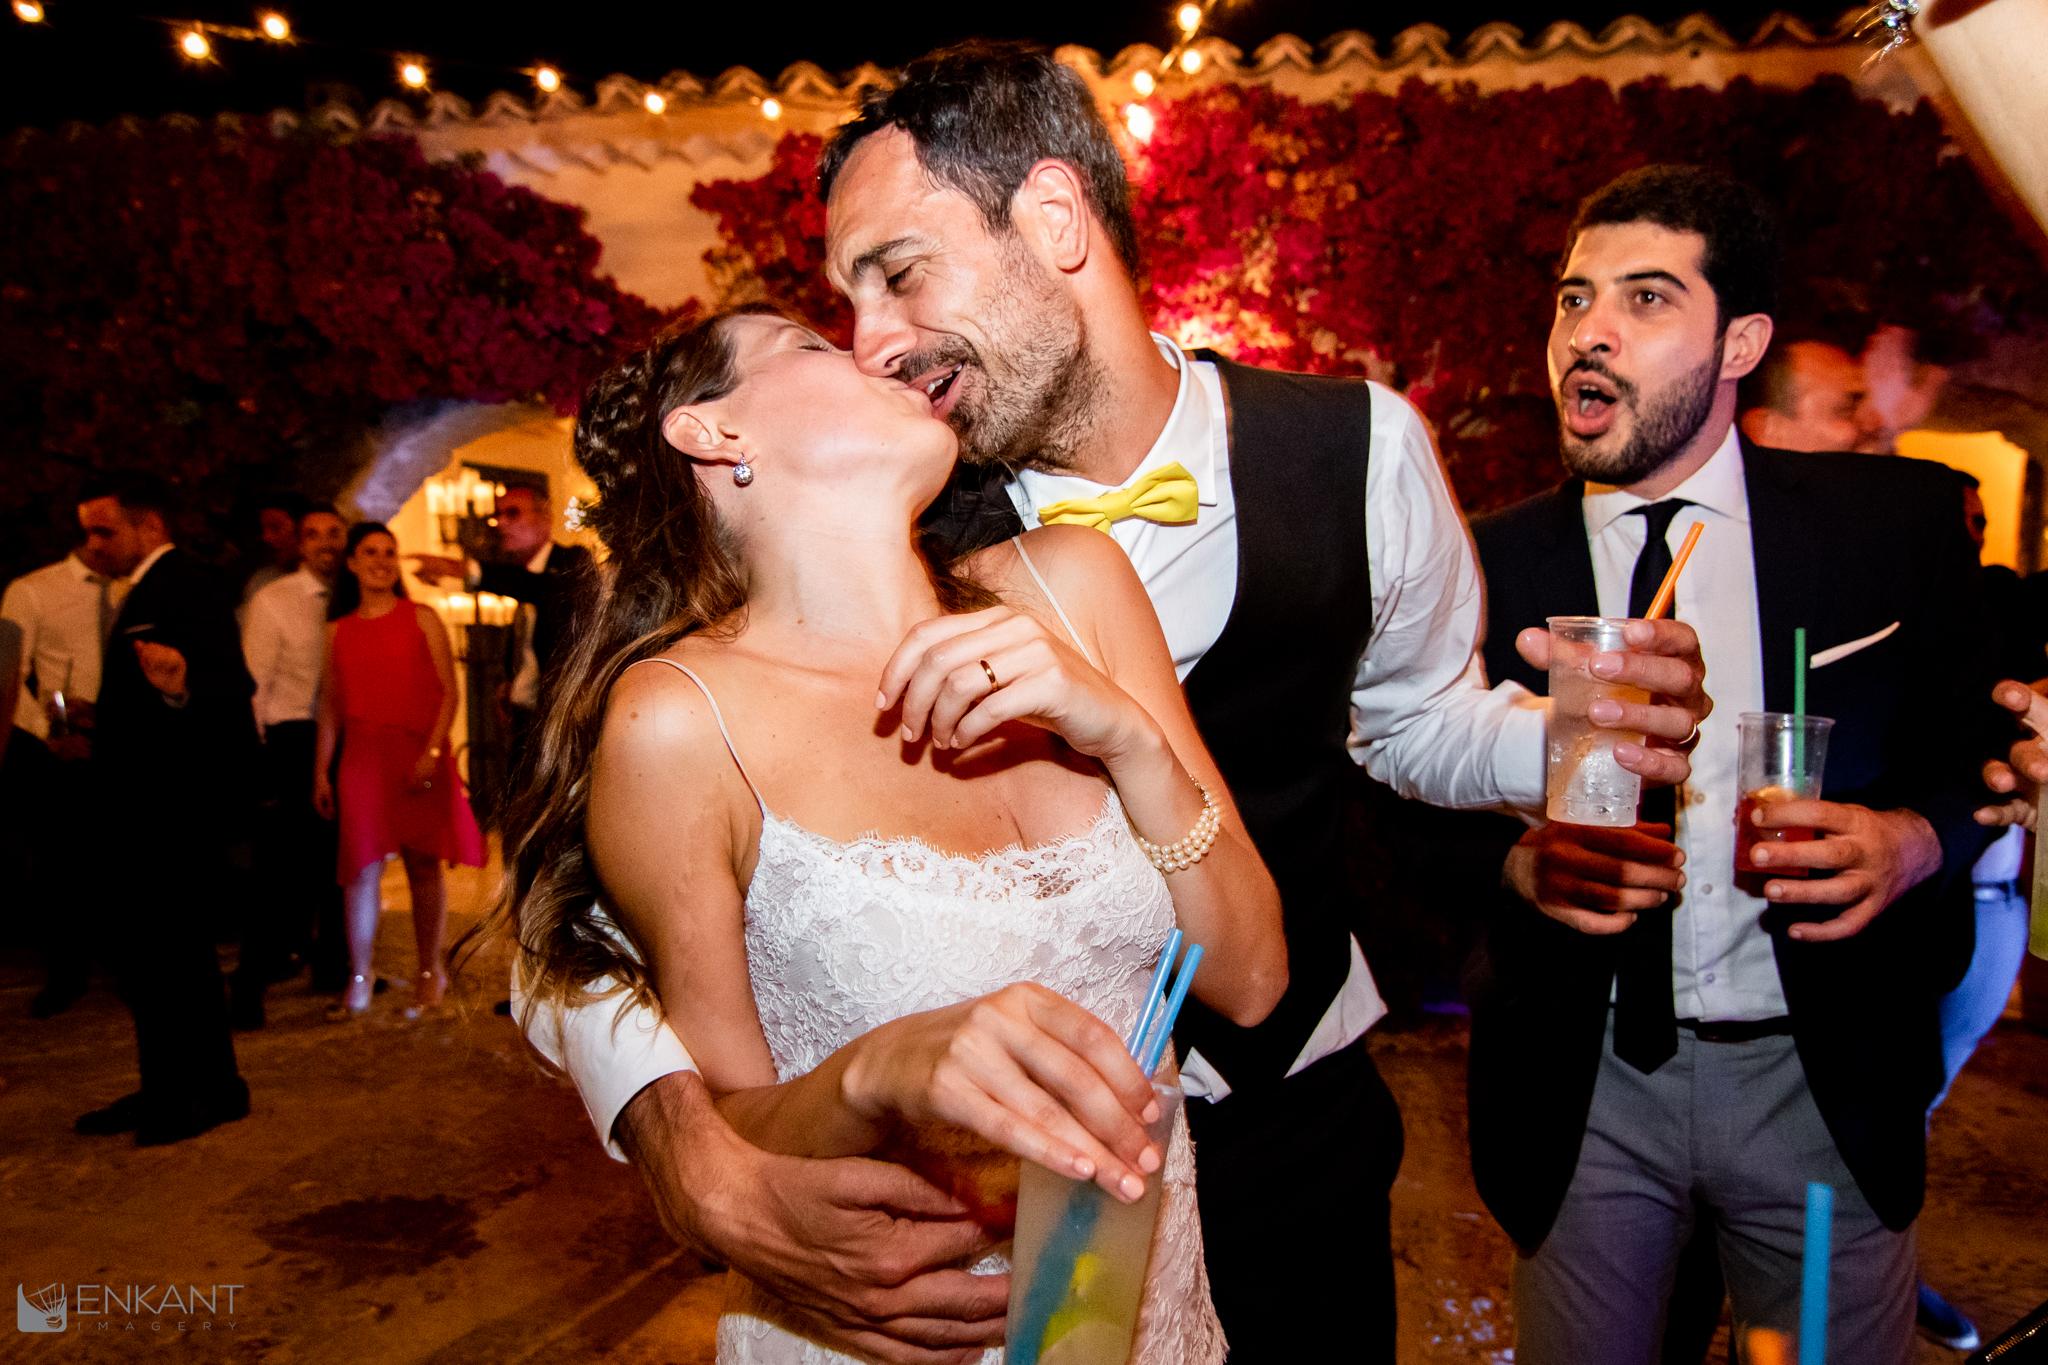 Fotografo matrimonio Sicilia - enkant Imagery-58.jpg